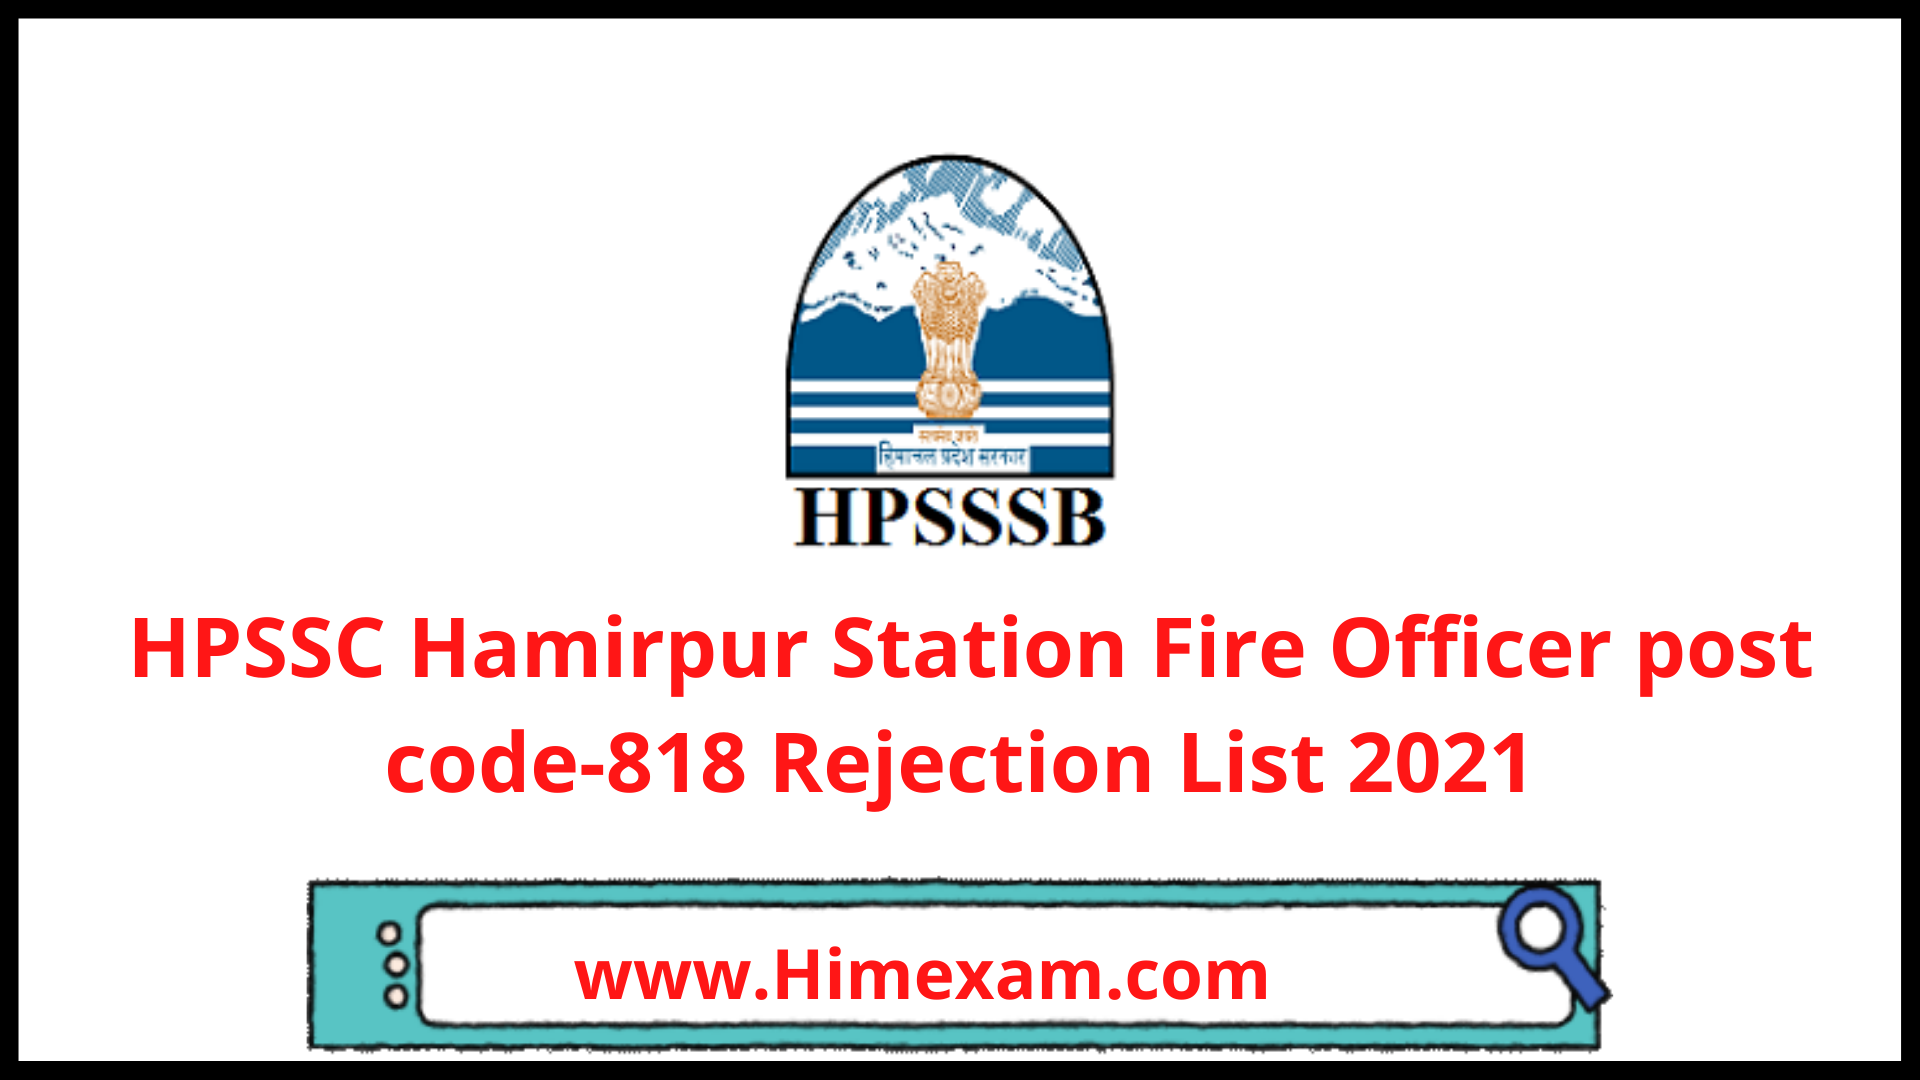 HPSSC Hamirpur Station Fire Officer post code-818 Rejection List 2021